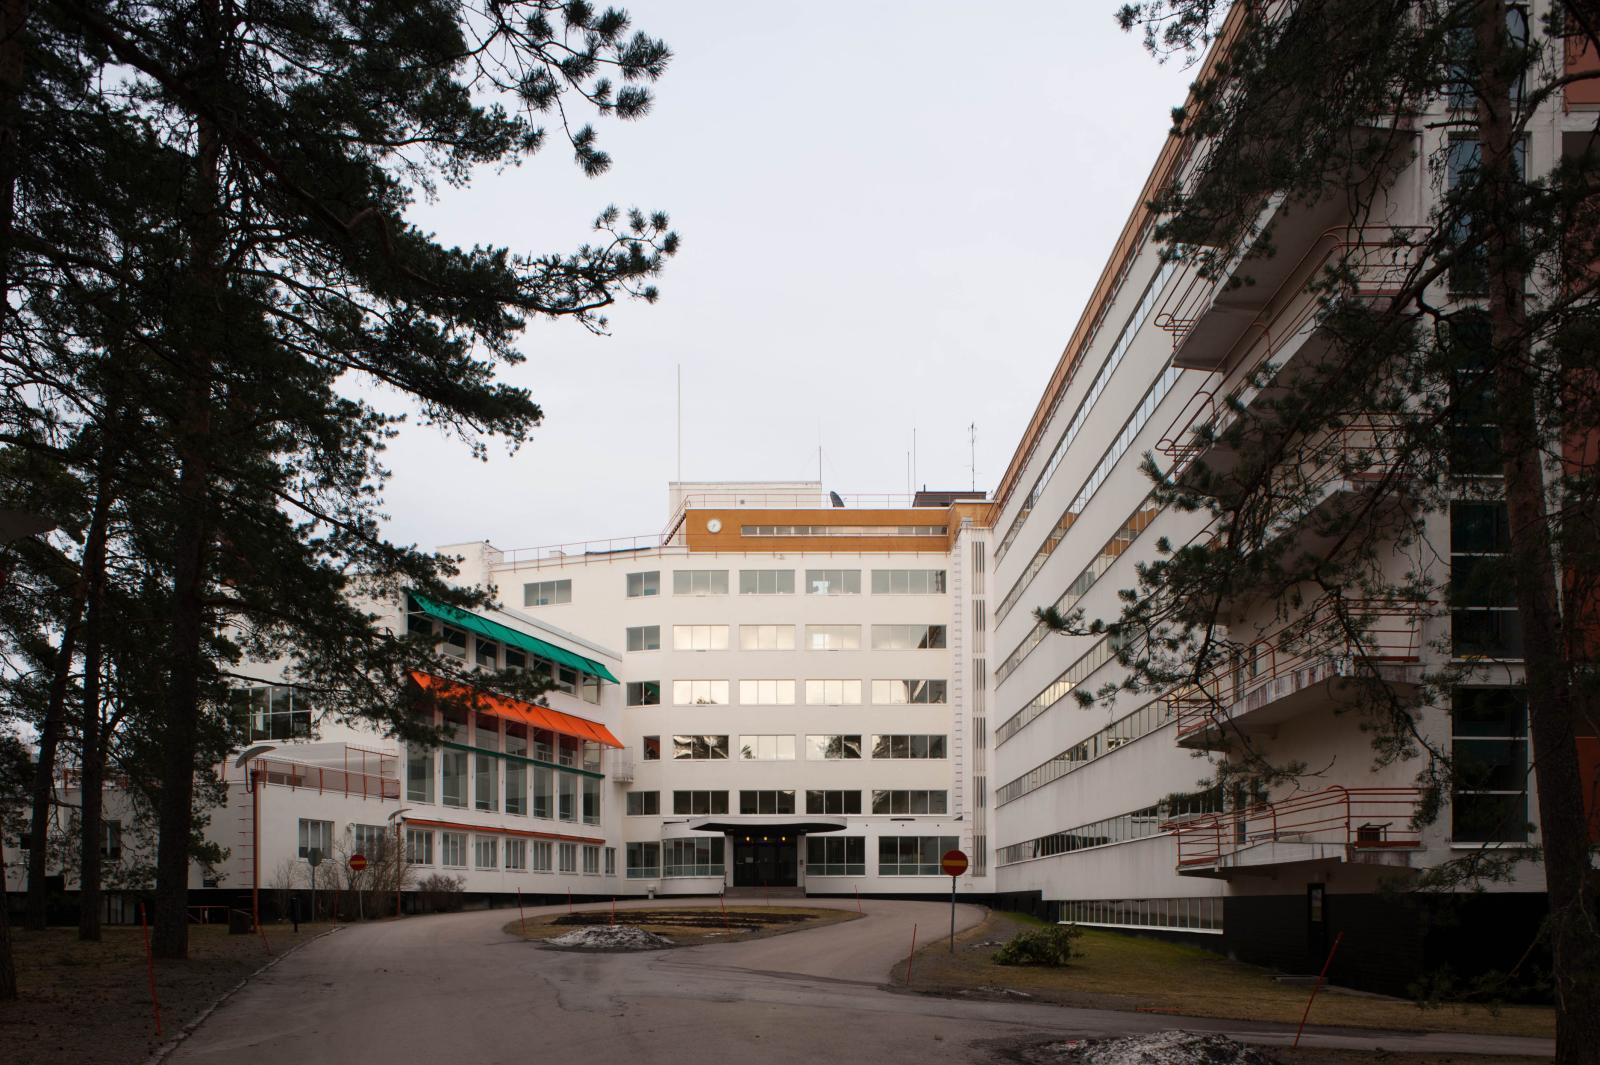 File:Paimio Sanatorium3.jpg - Wikimedia Commons